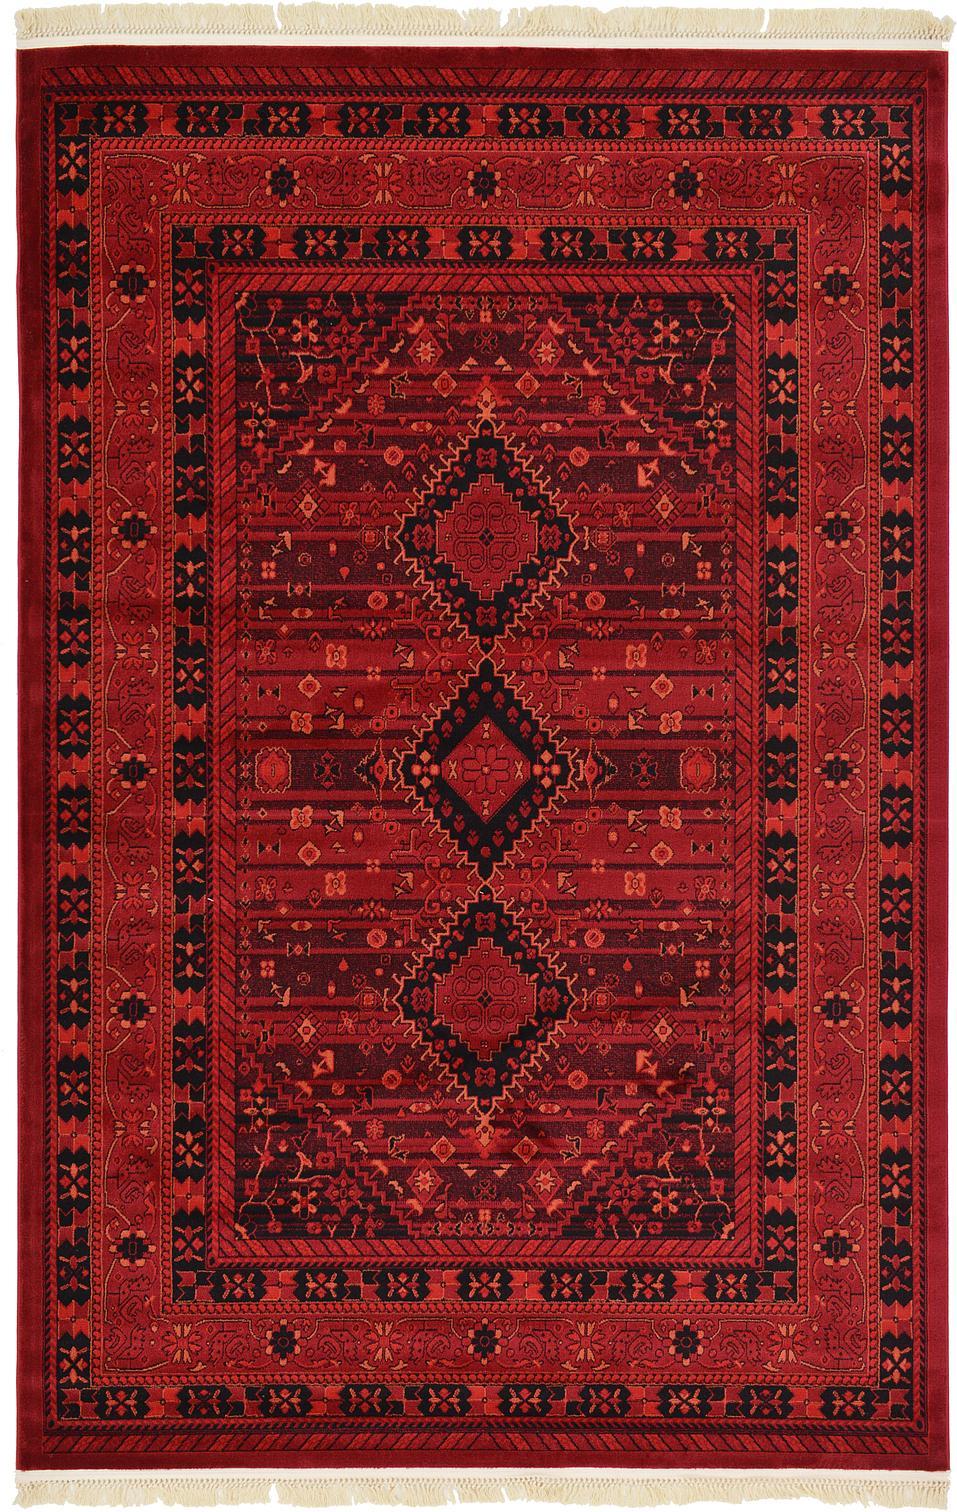 red 6 39 x 9 39 bokhara rug area rugs. Black Bedroom Furniture Sets. Home Design Ideas